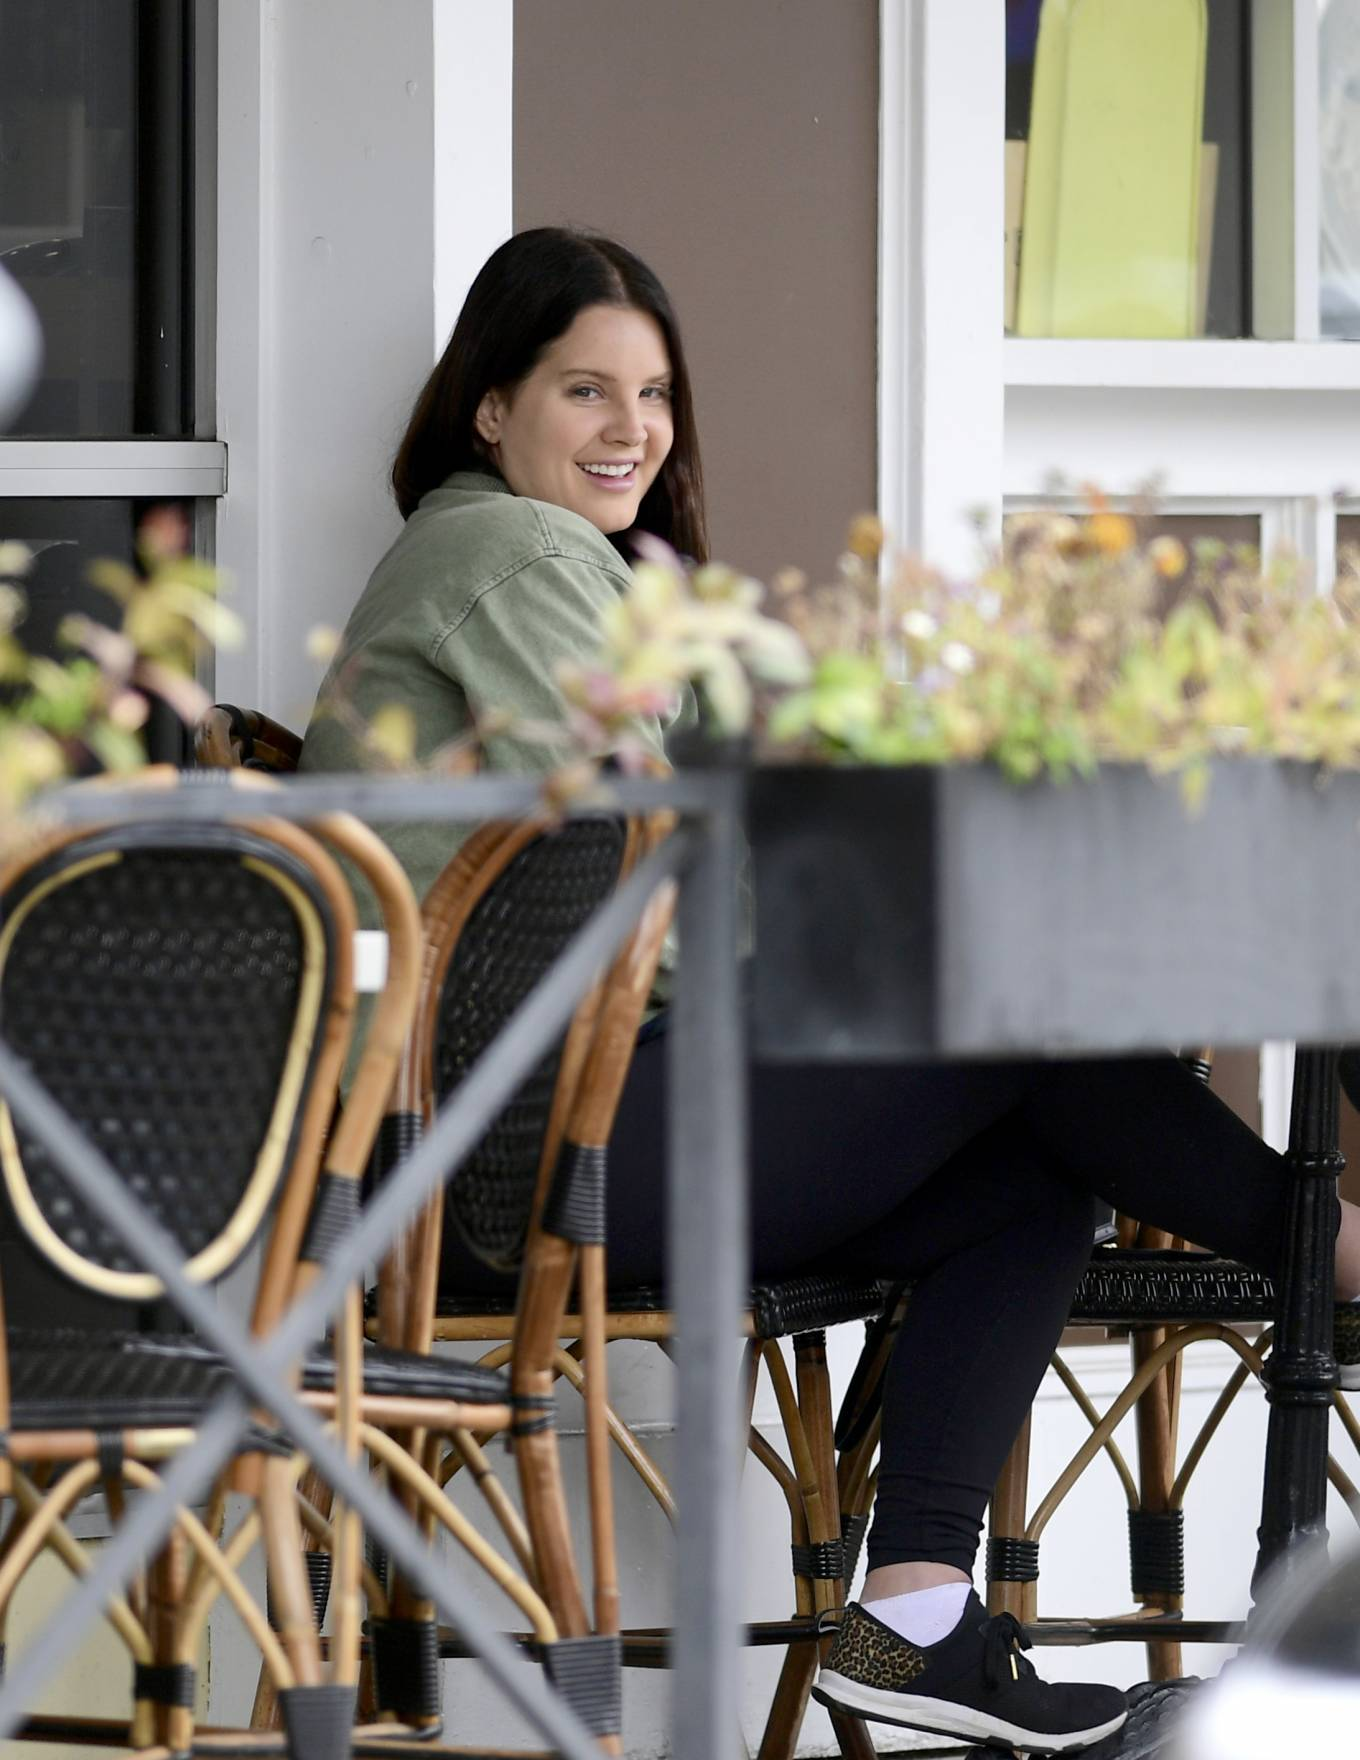 Lana Del Rey 2021 : Lana Del Rey – Seen with her mother in Los Angeles-09